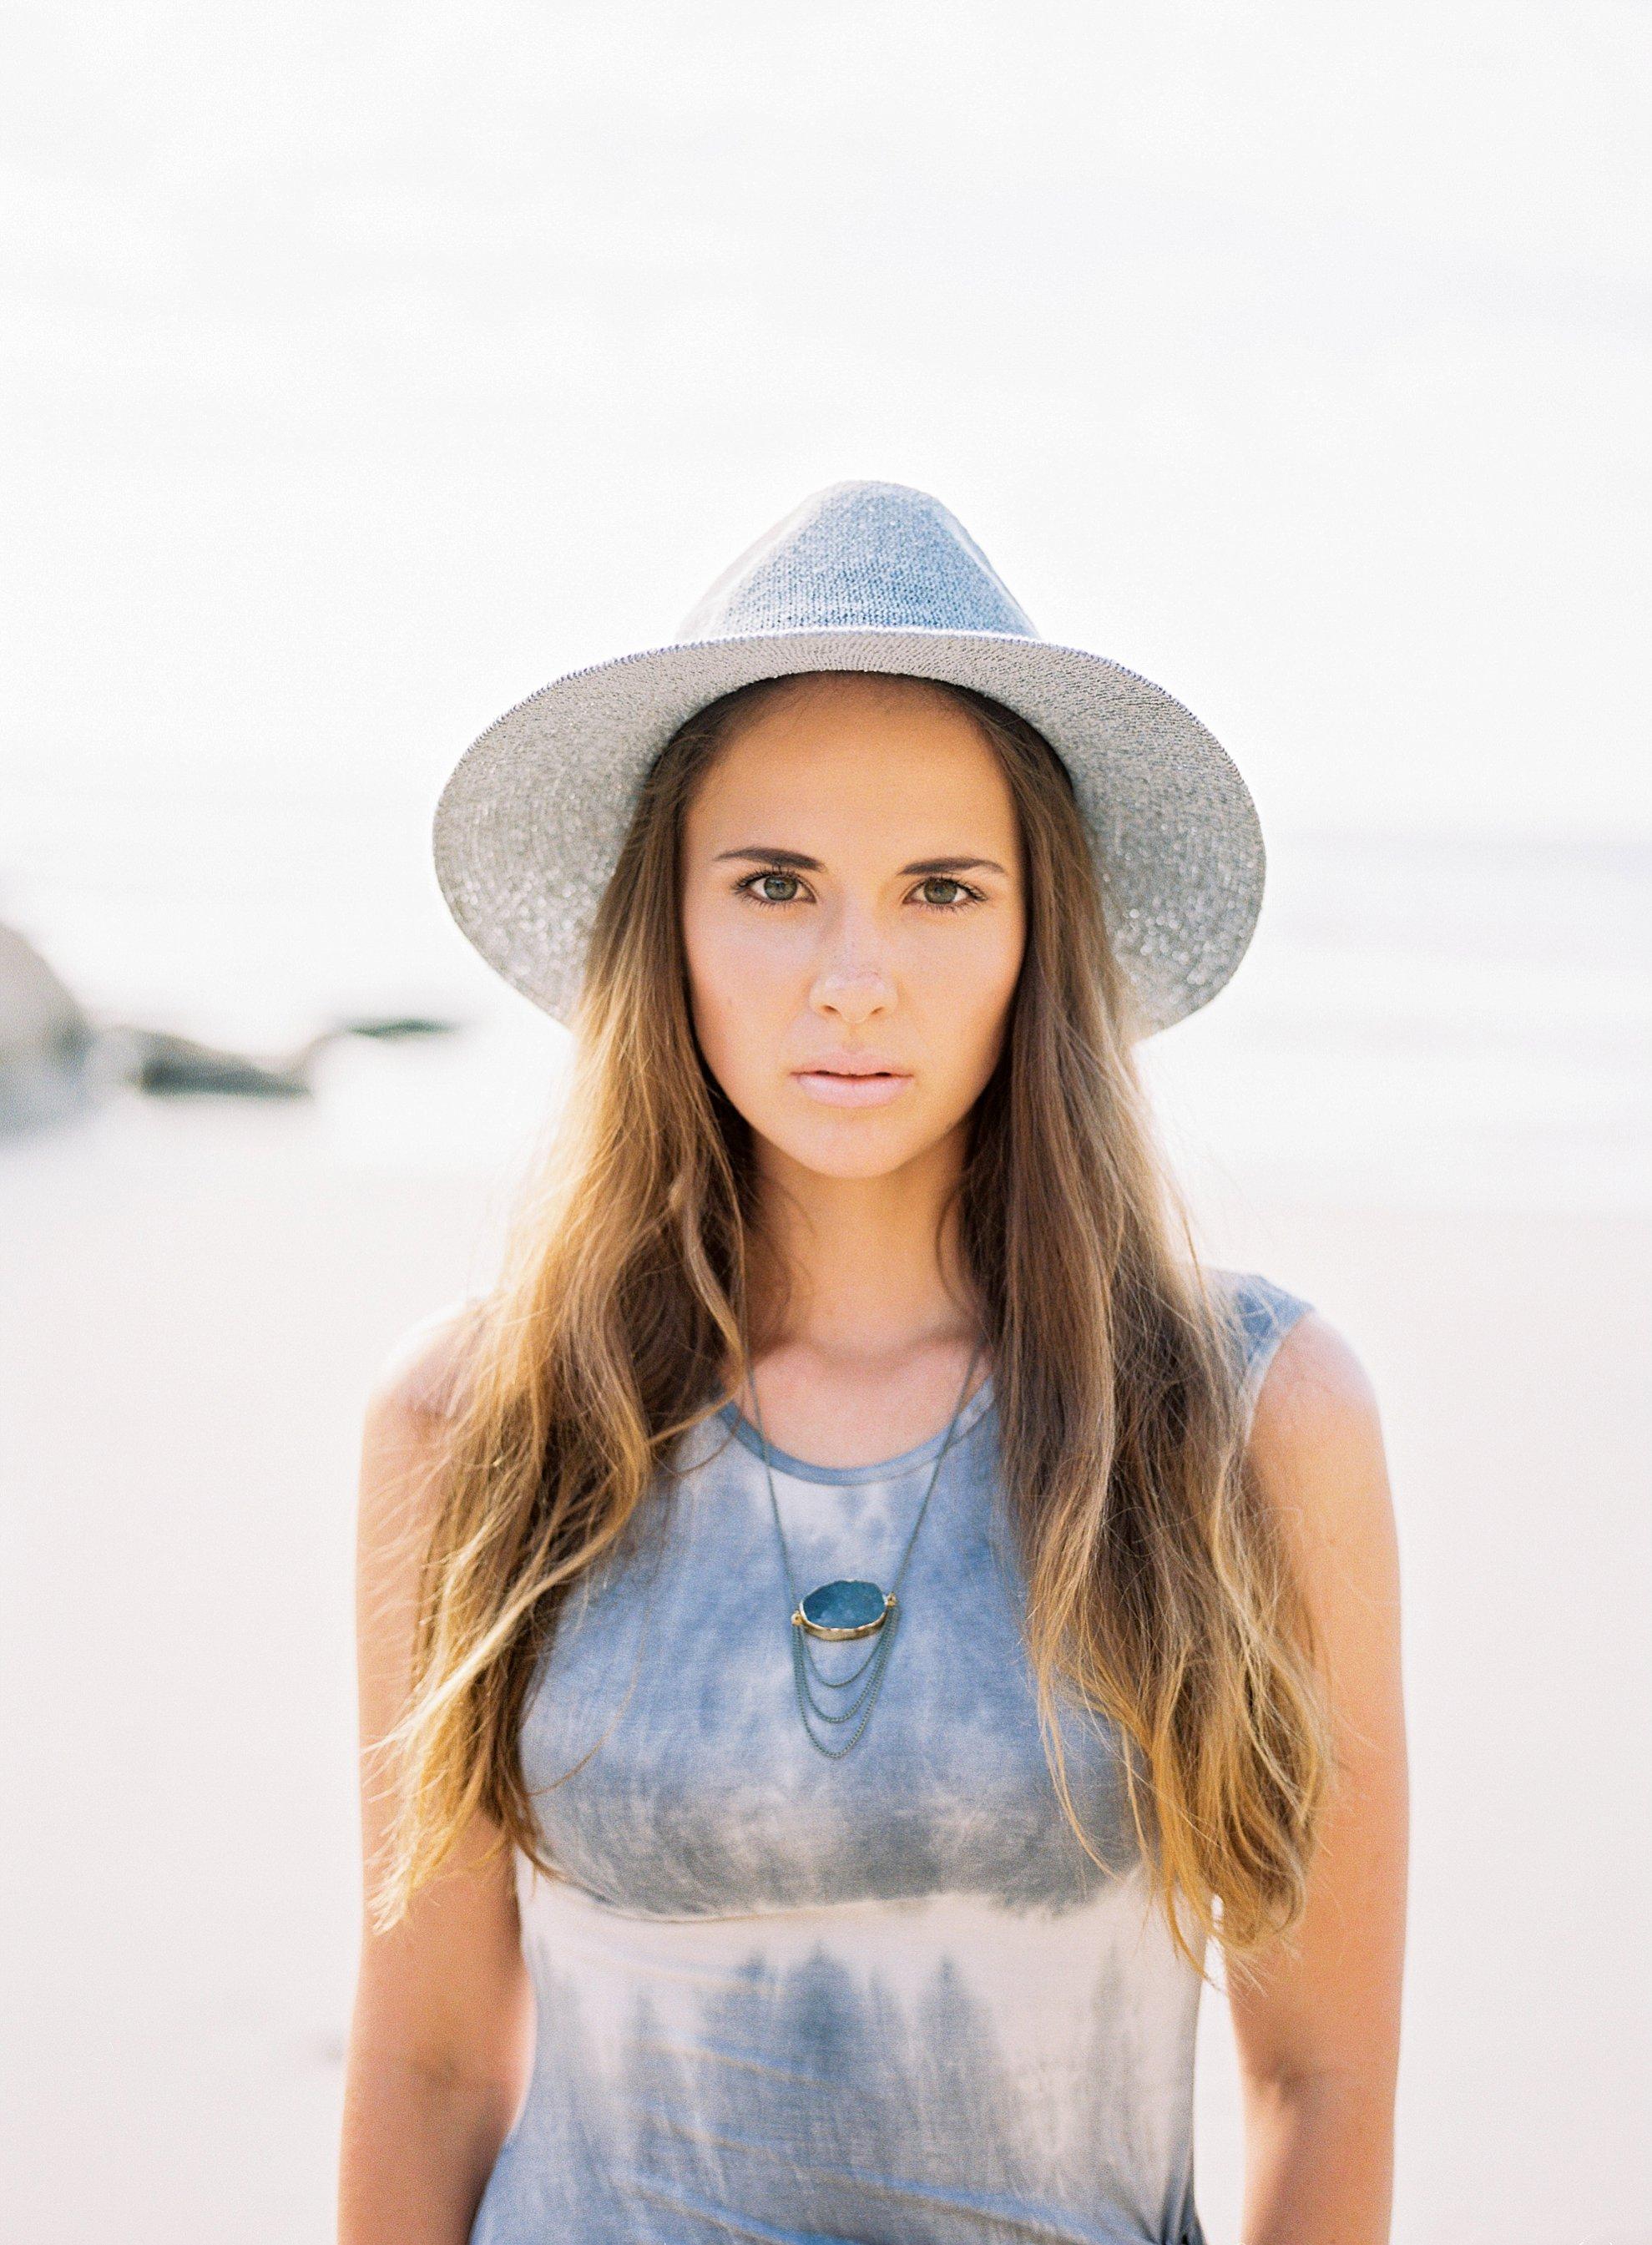 Amanda-Drost-photography-editorial-South-Africa-fashion-fotografie-mode-Zuid-Afrika_0001.jpg